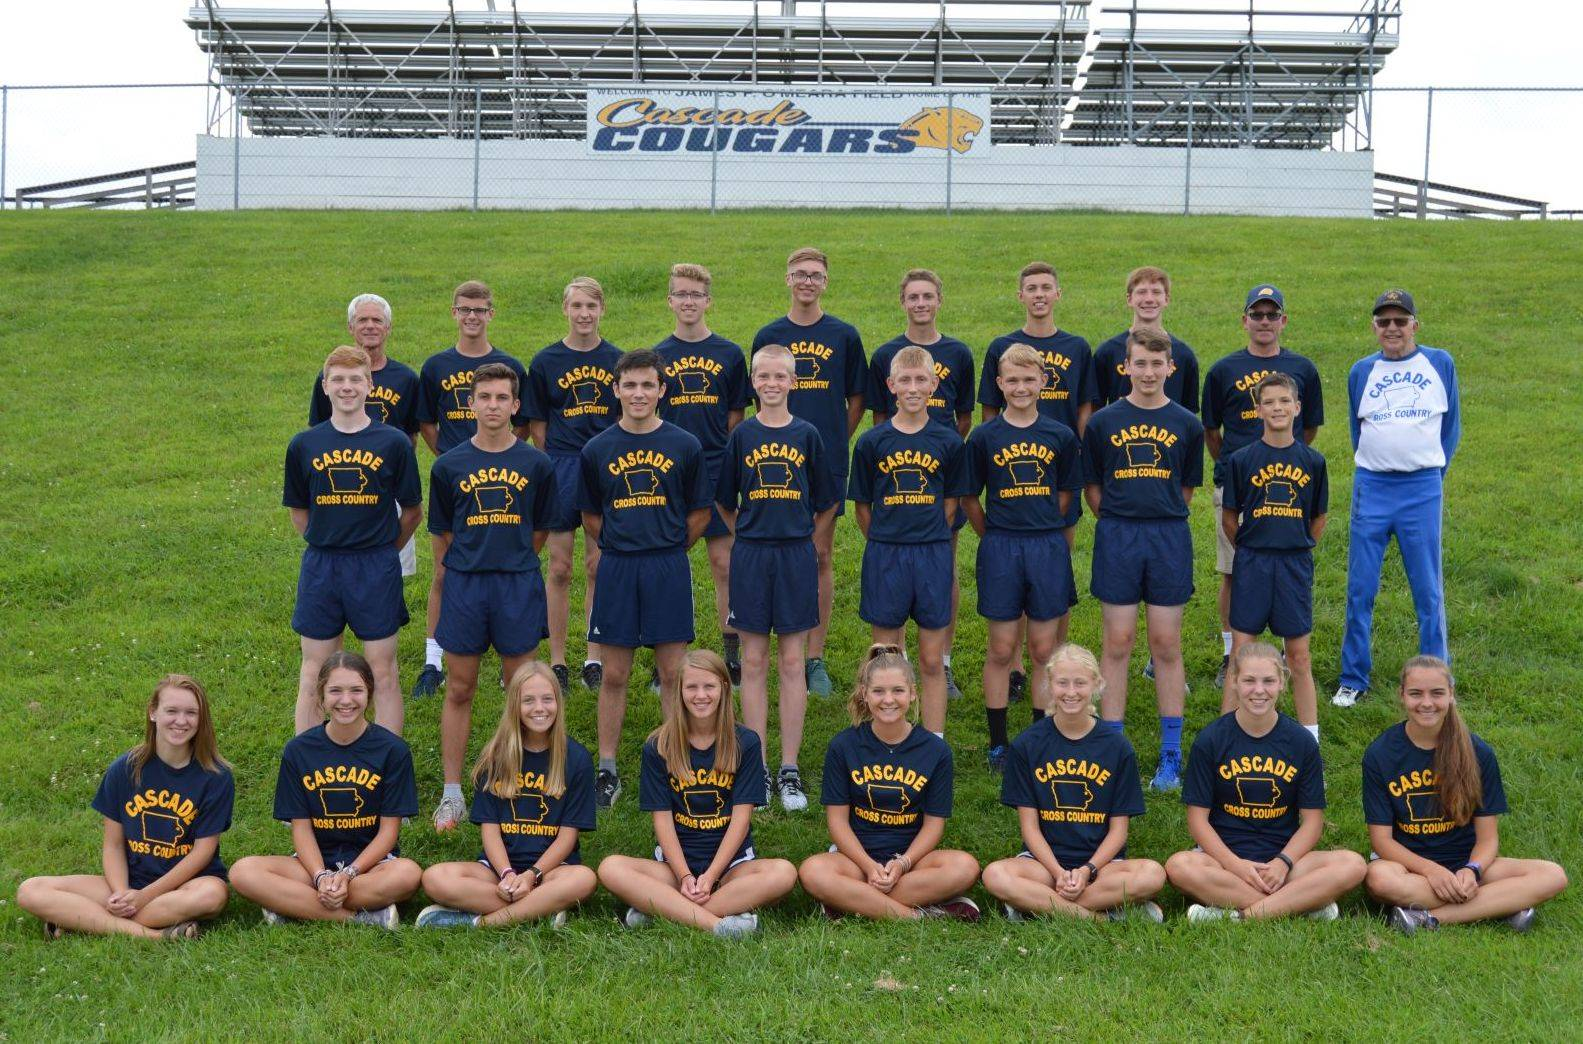 Cross country team members